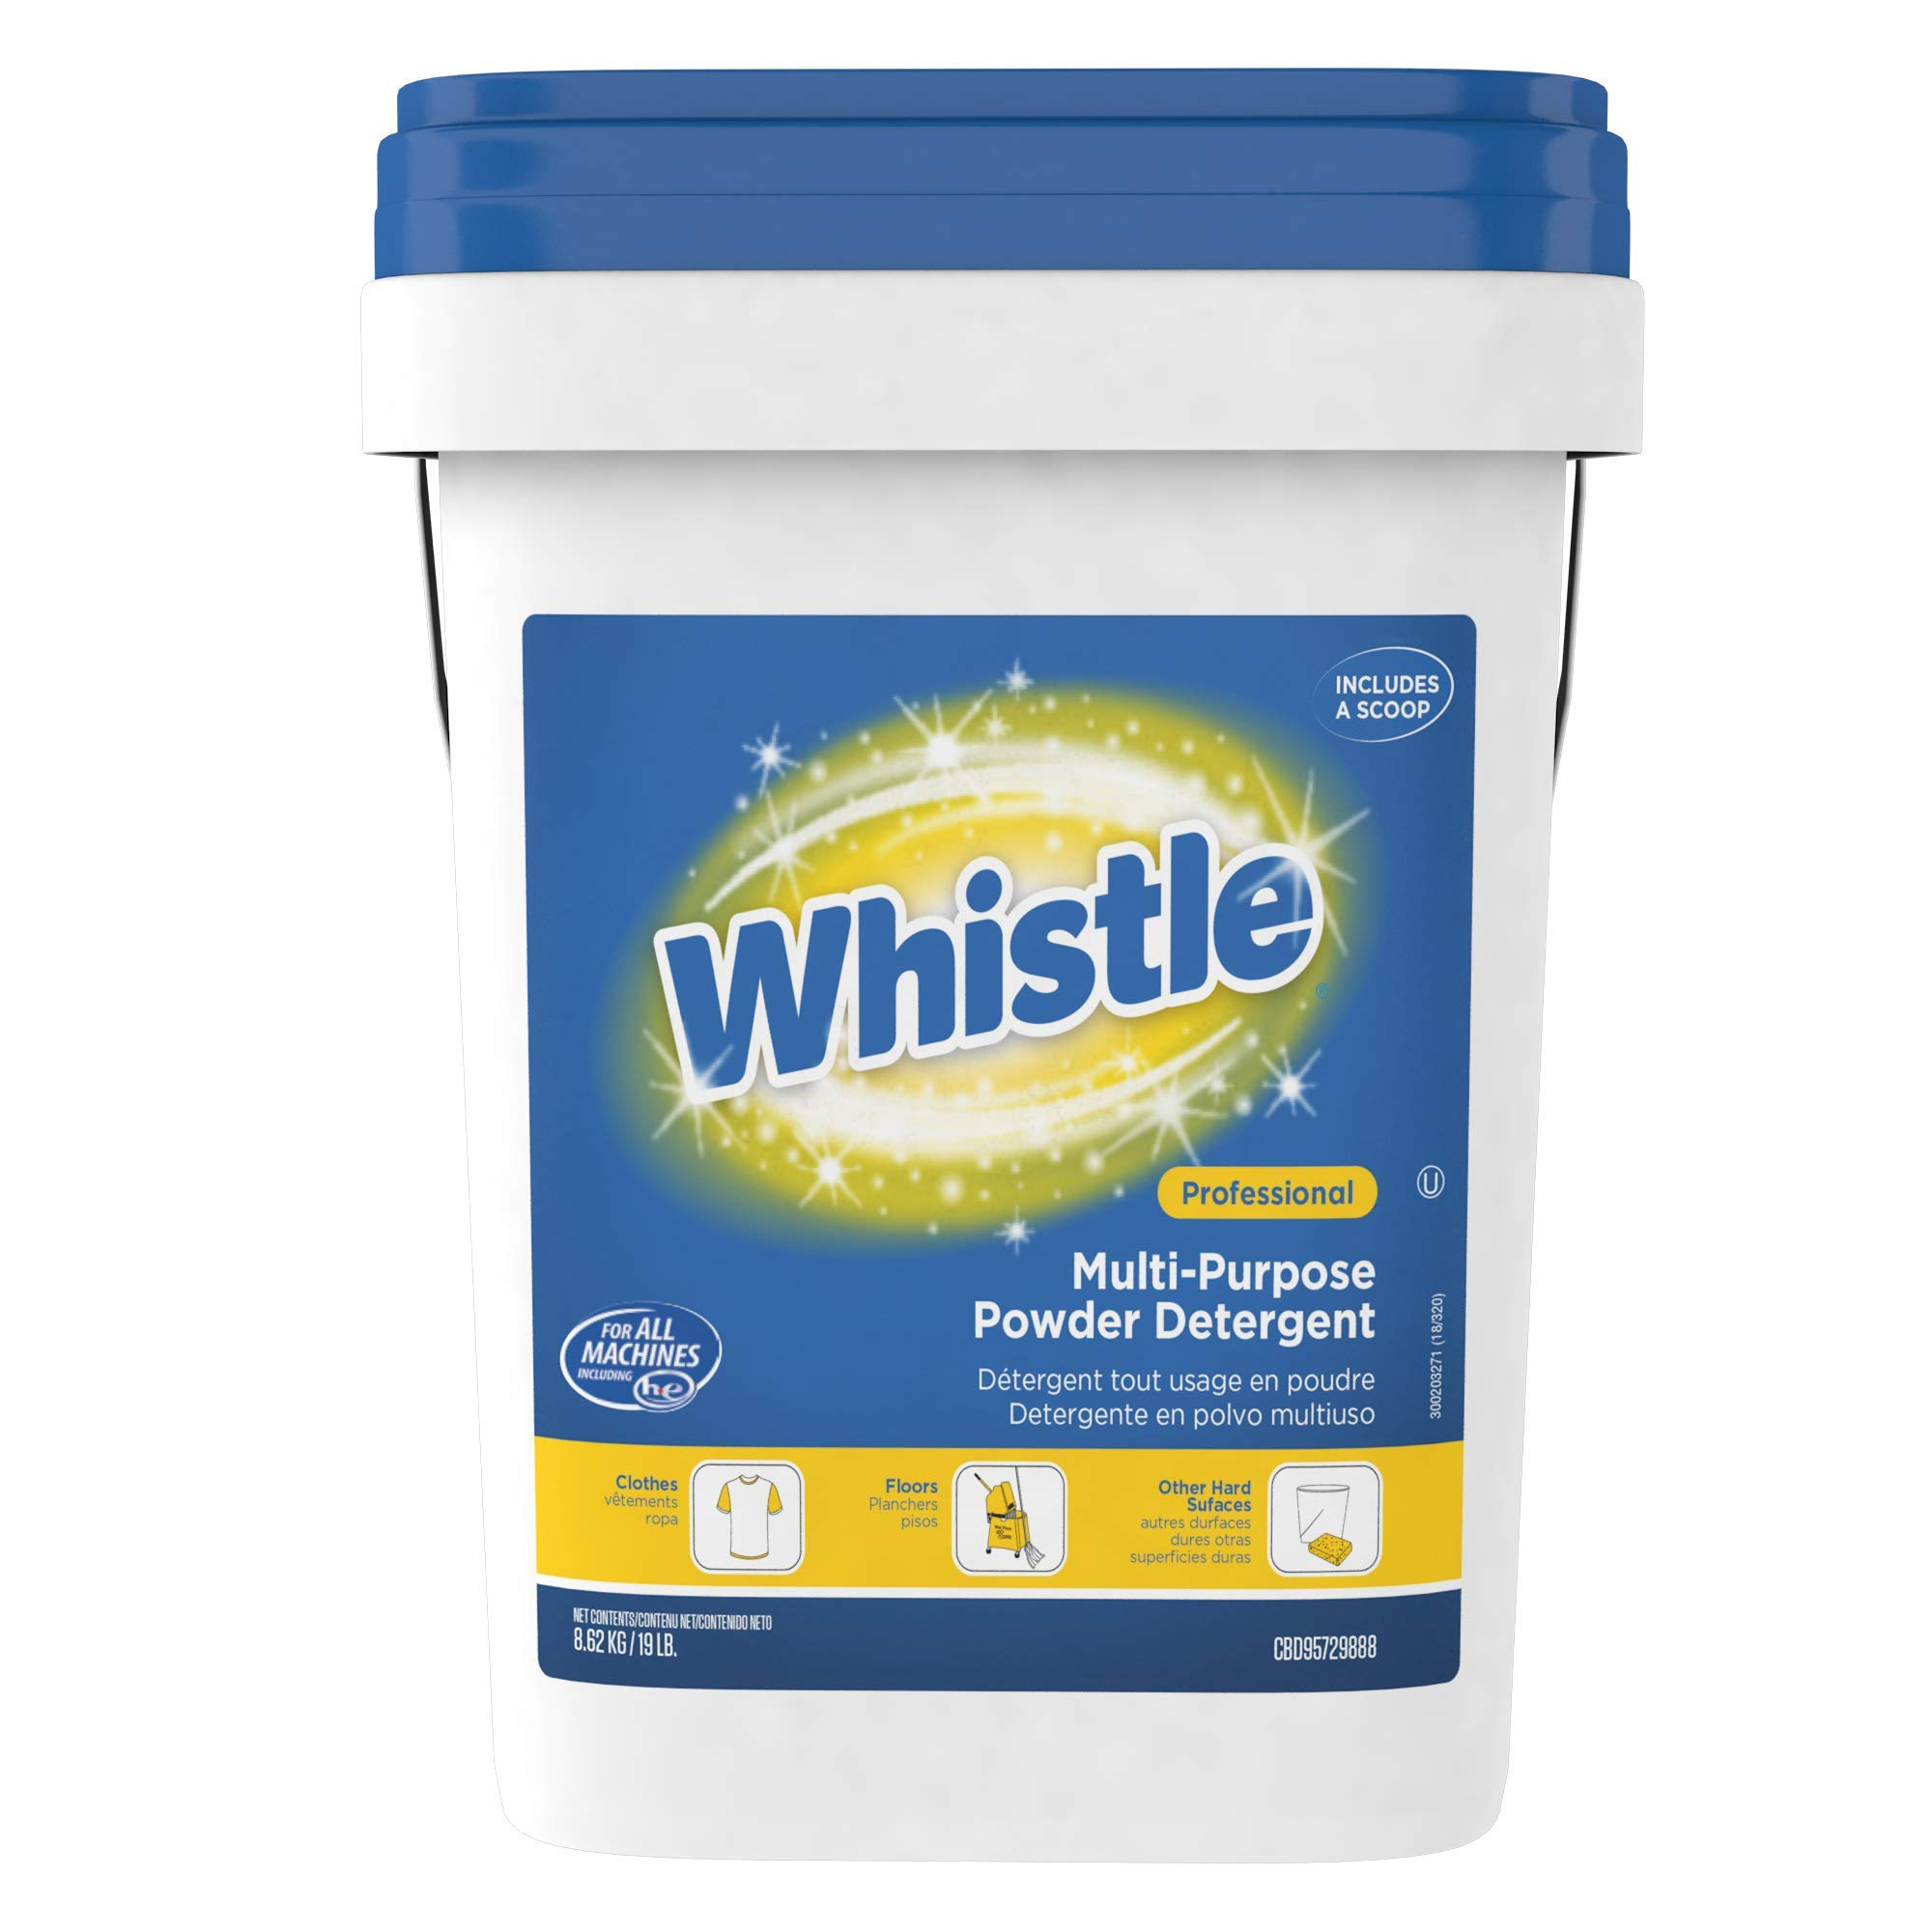 Diversey Whistle Multi-Purpose Powder Detergent, 19 lb Pail by Diversey